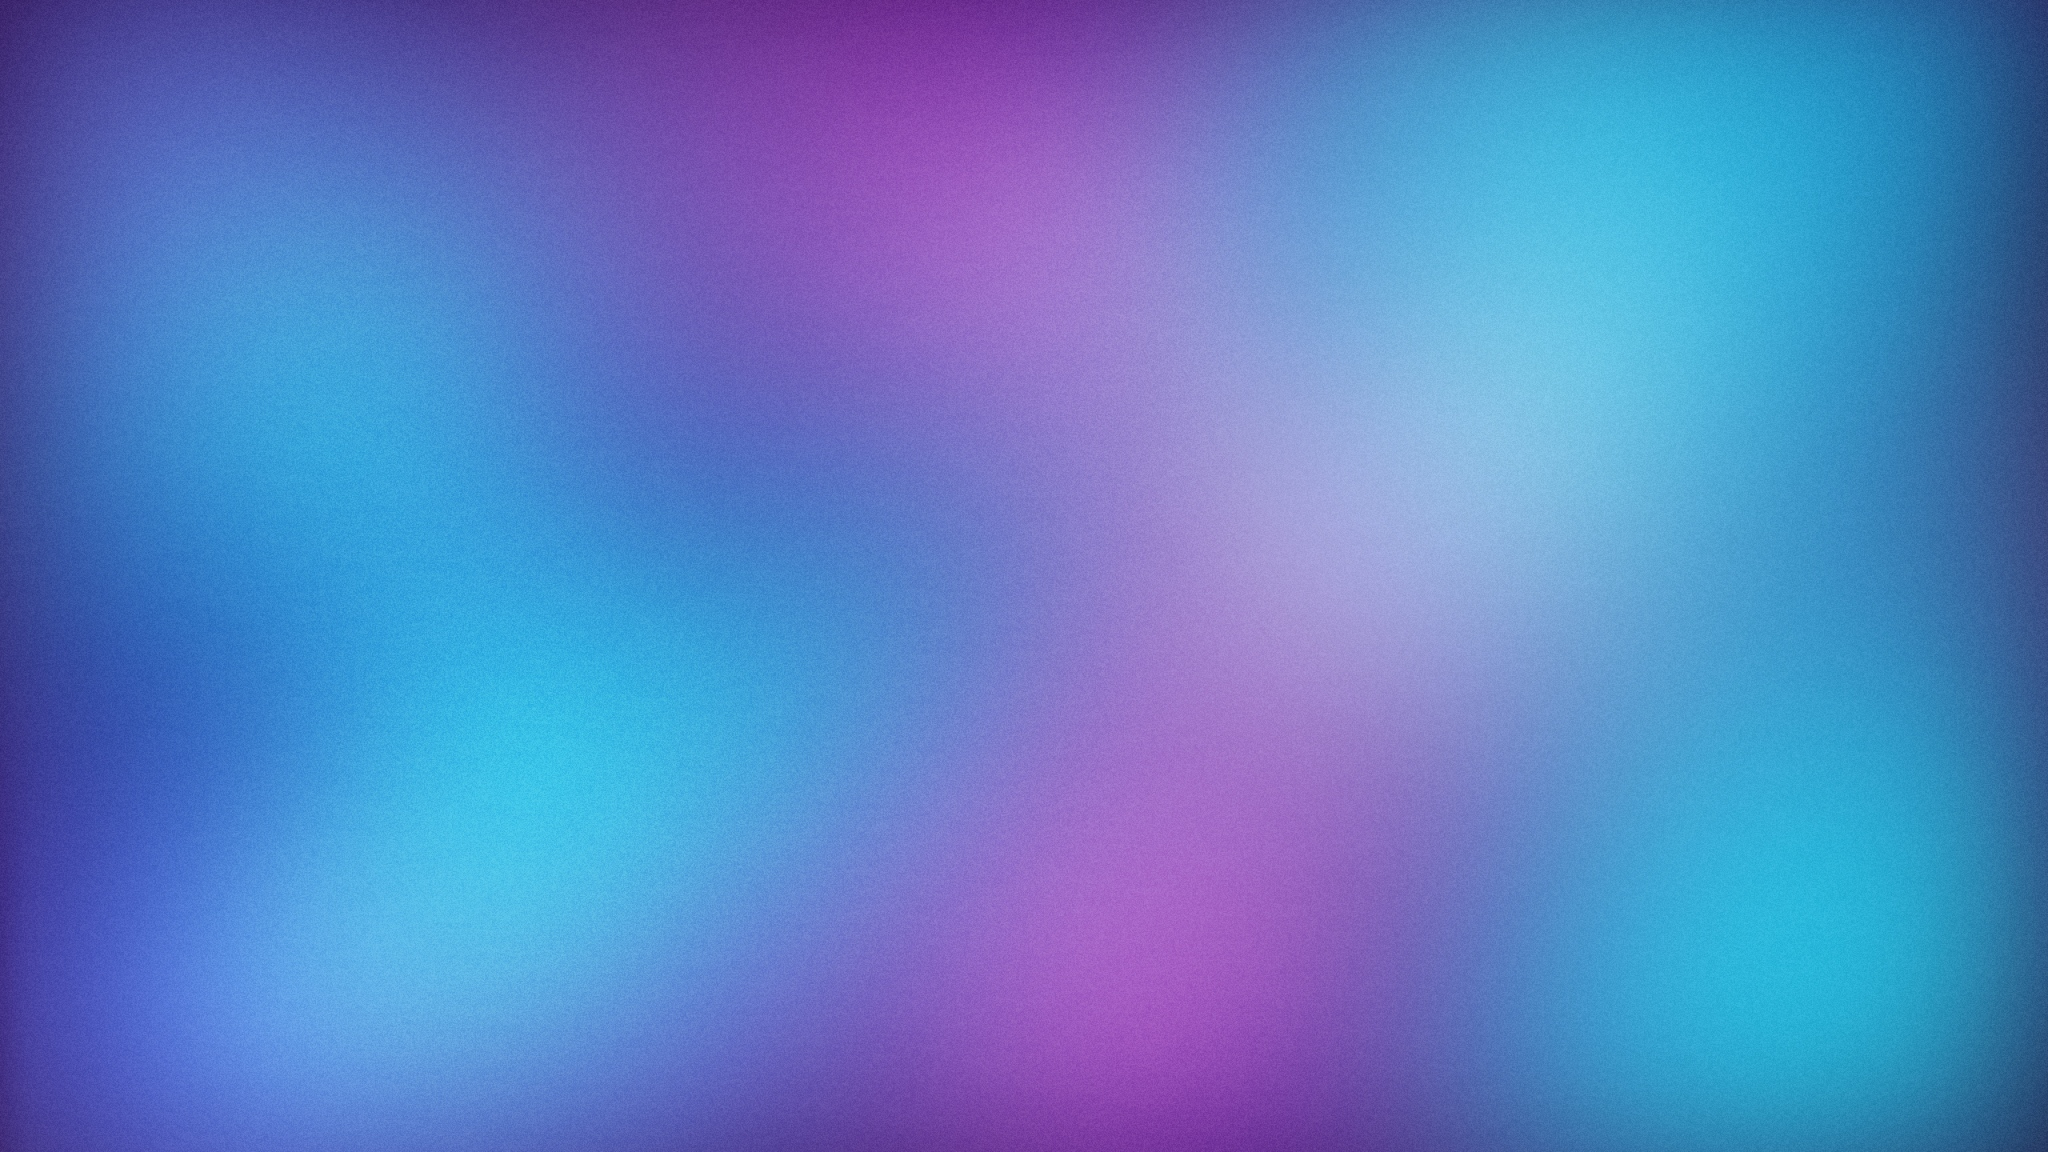 blue tie dye background photo - 1